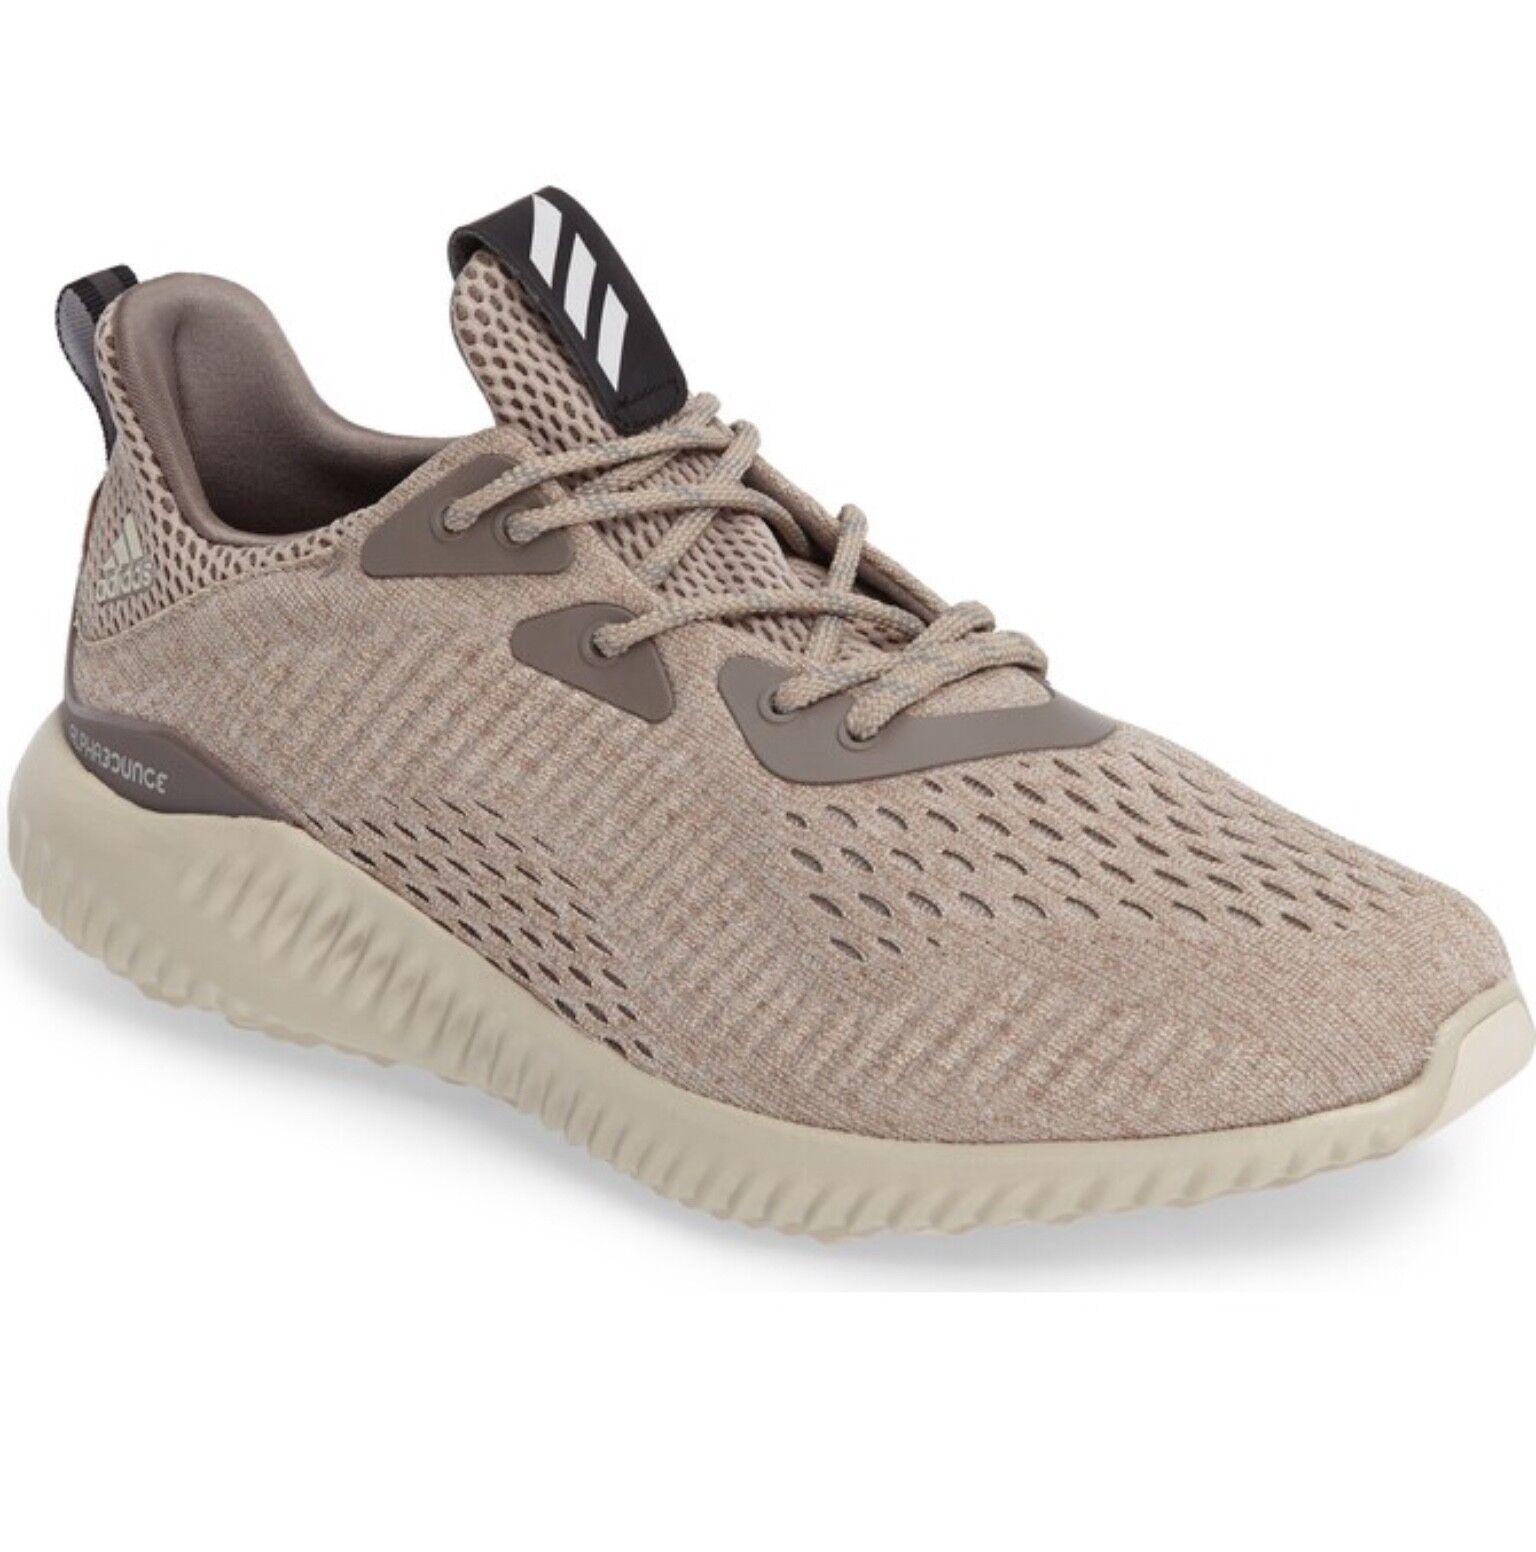 Adidas alphabounce alphabounce Adidas em männer laufschuhe bw0325 bfa3b9